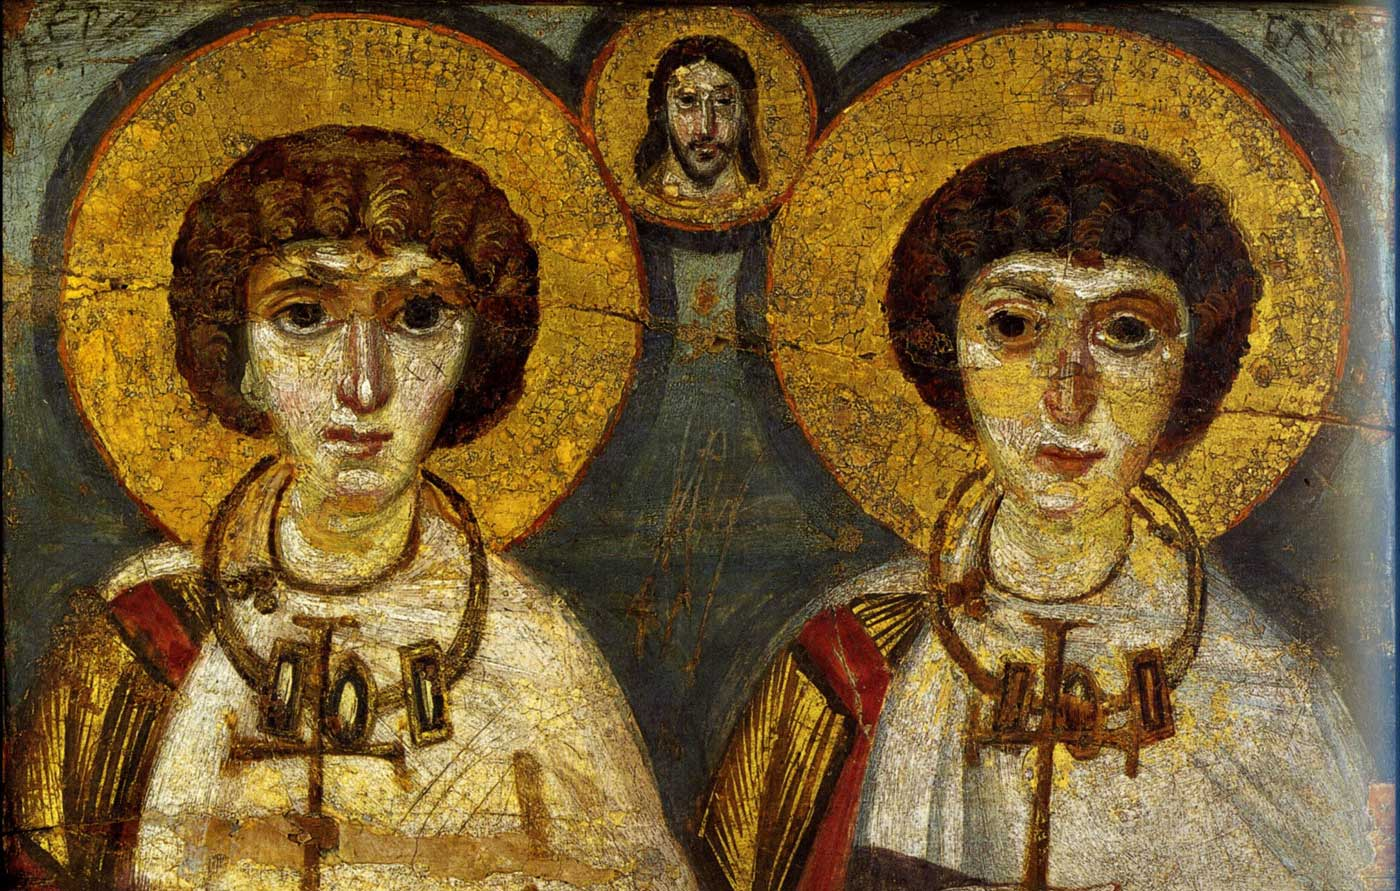 Matrimonio Romano Cristiano : Cristianismo tolerancia y matrimonio igualitario verdeseo